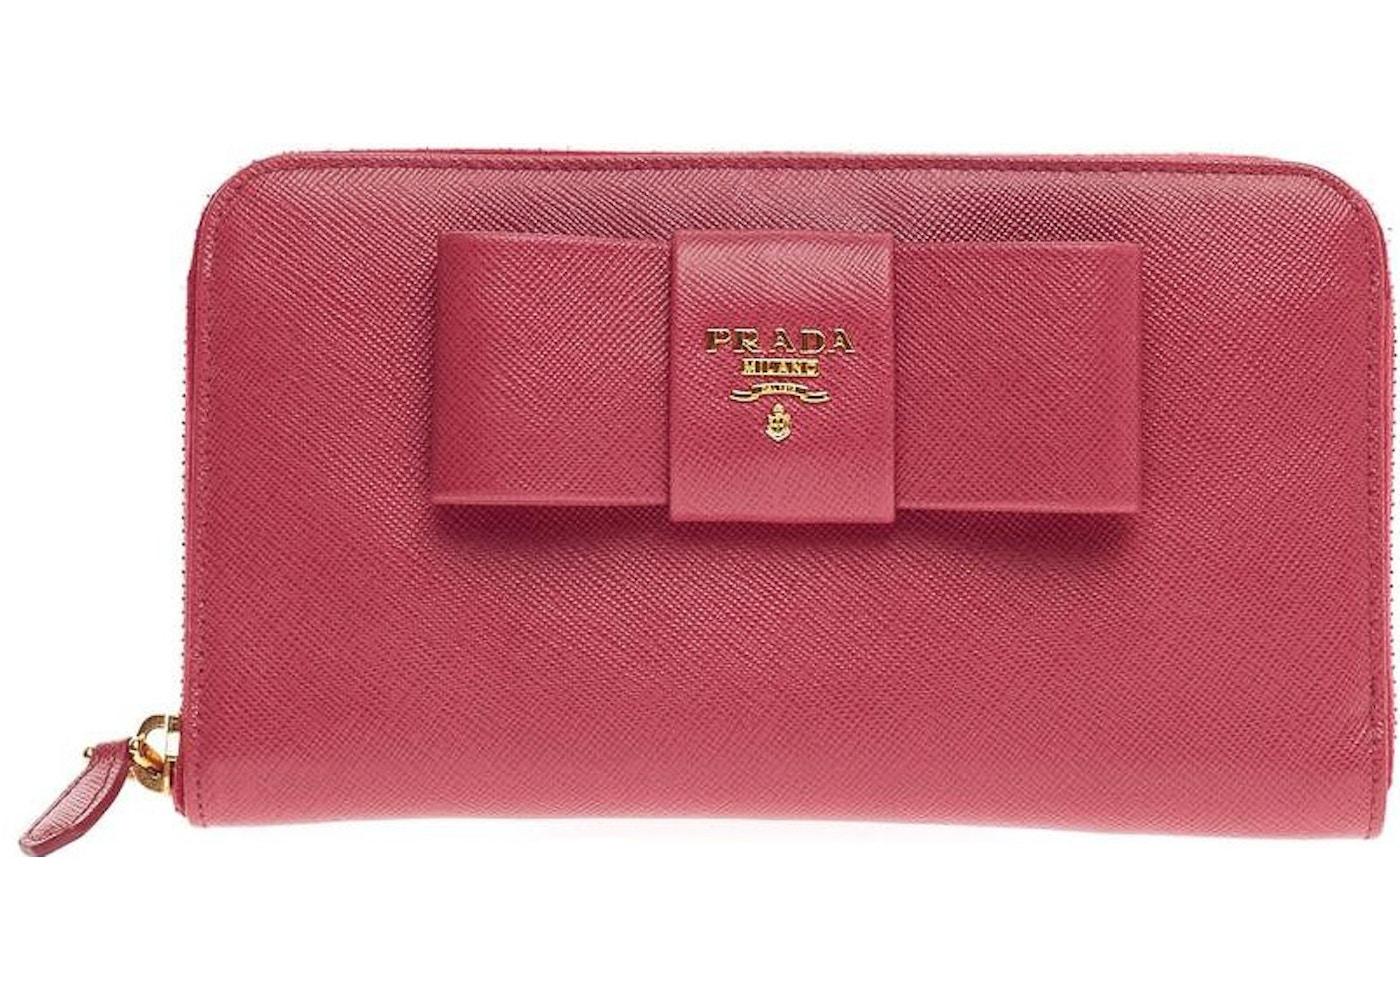 564cee042cbb82 Prada Zip Around Bow Wallet Saffiano Pink. Saffiano Pink